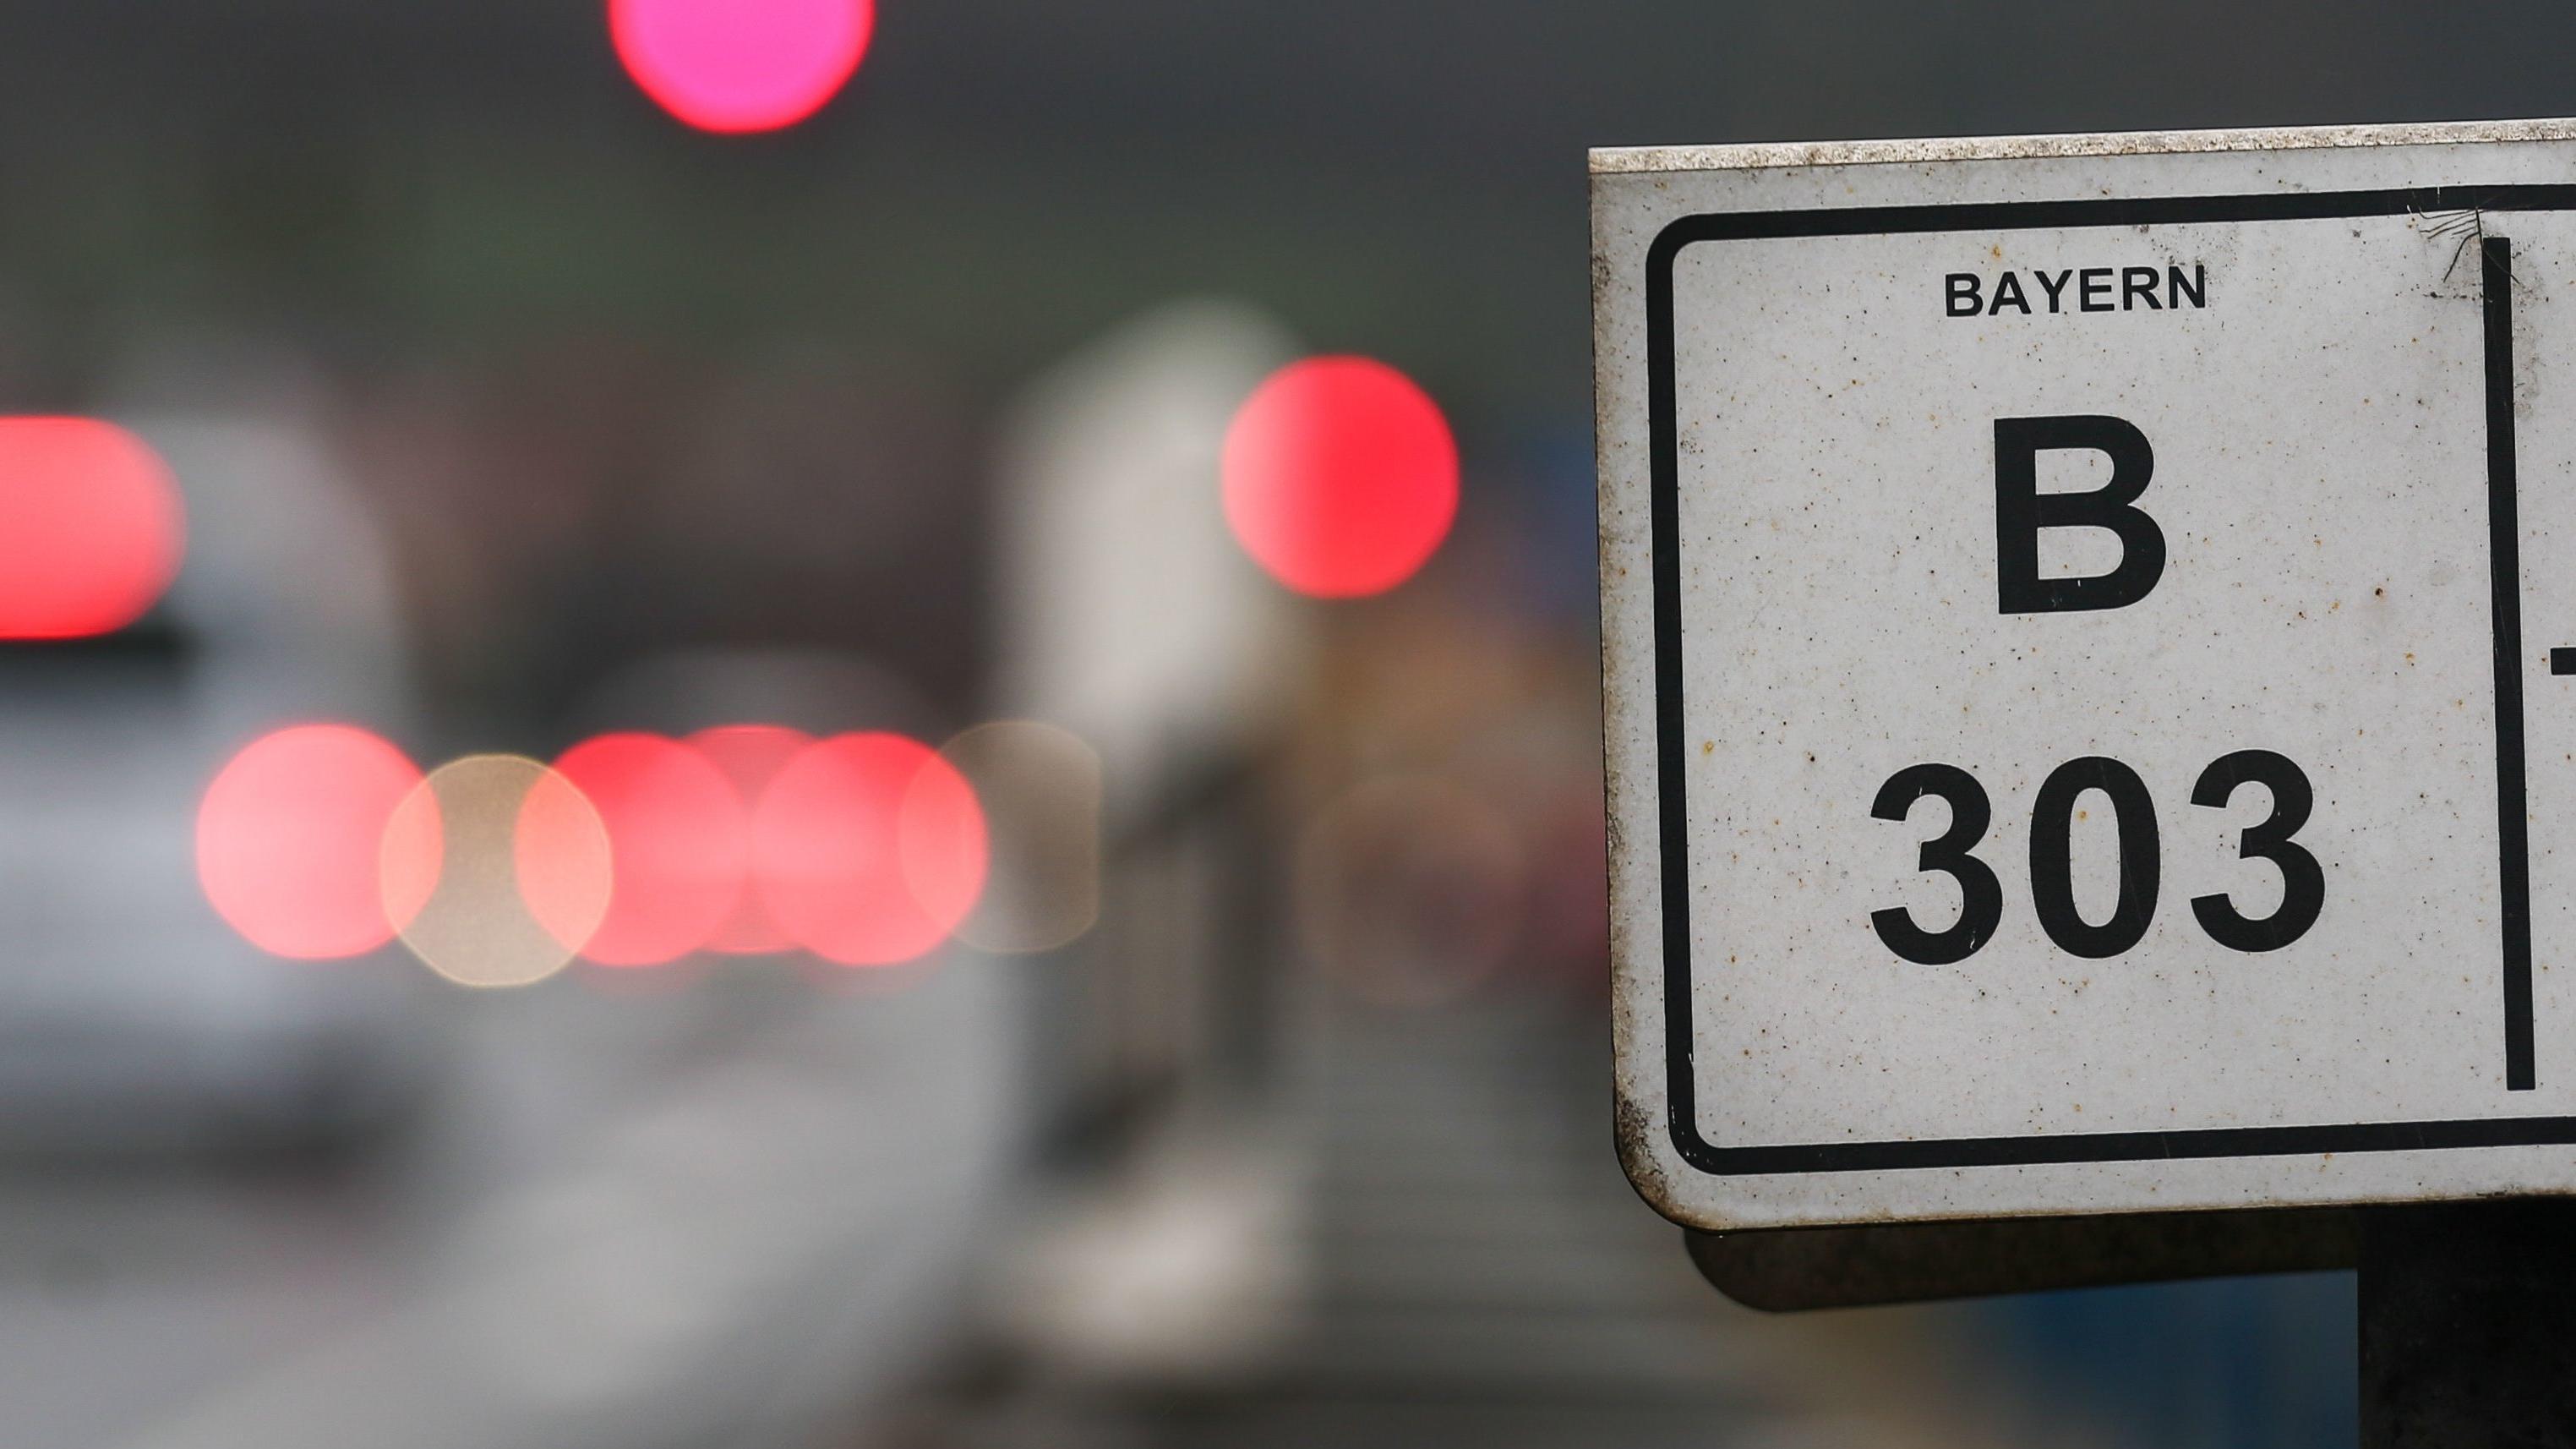 Bundesstraße 303 in Bayern